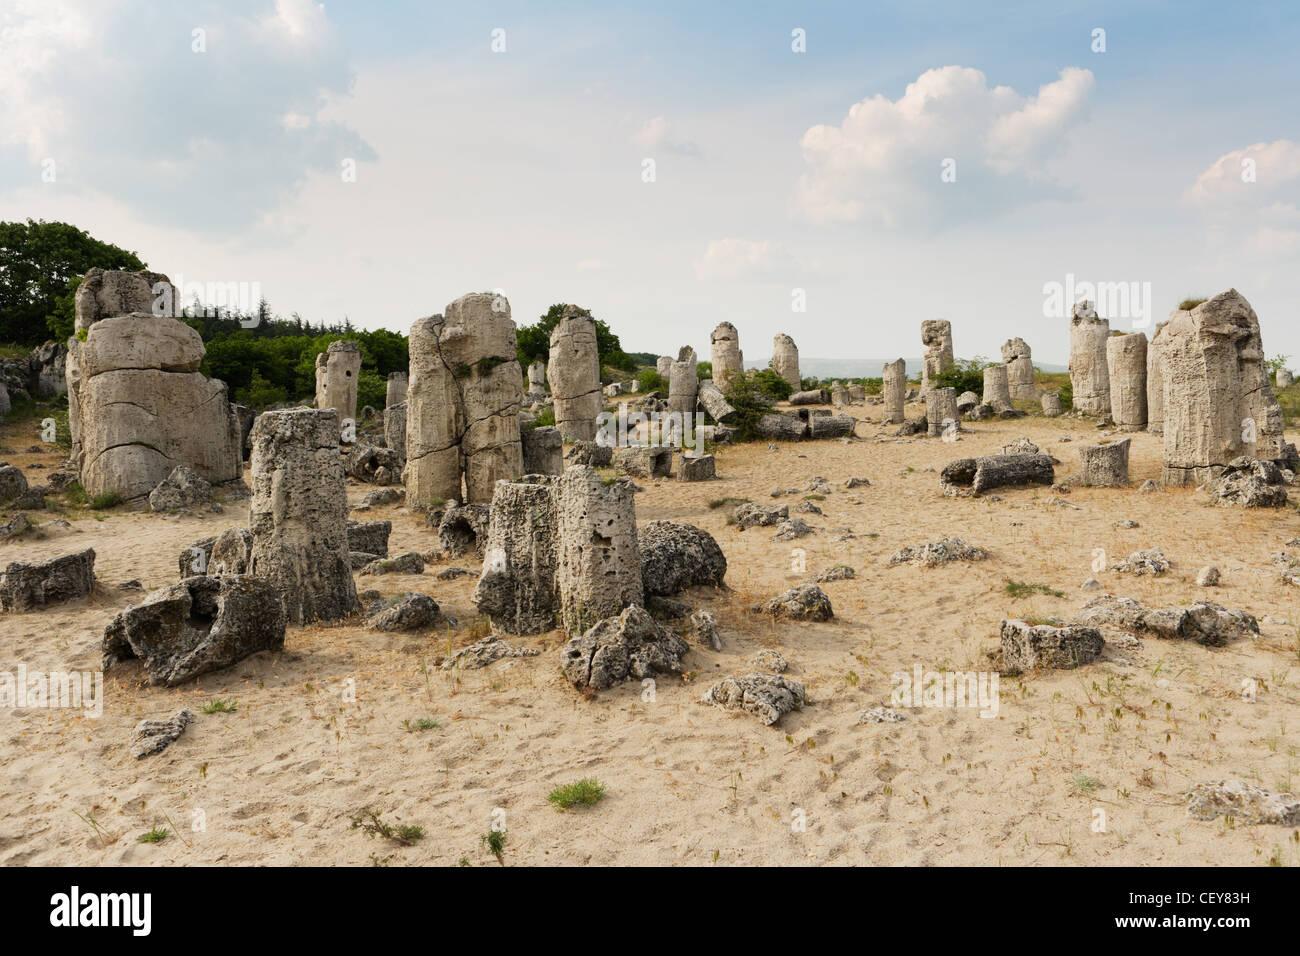 Stone phenomenon near varna - Stock Image